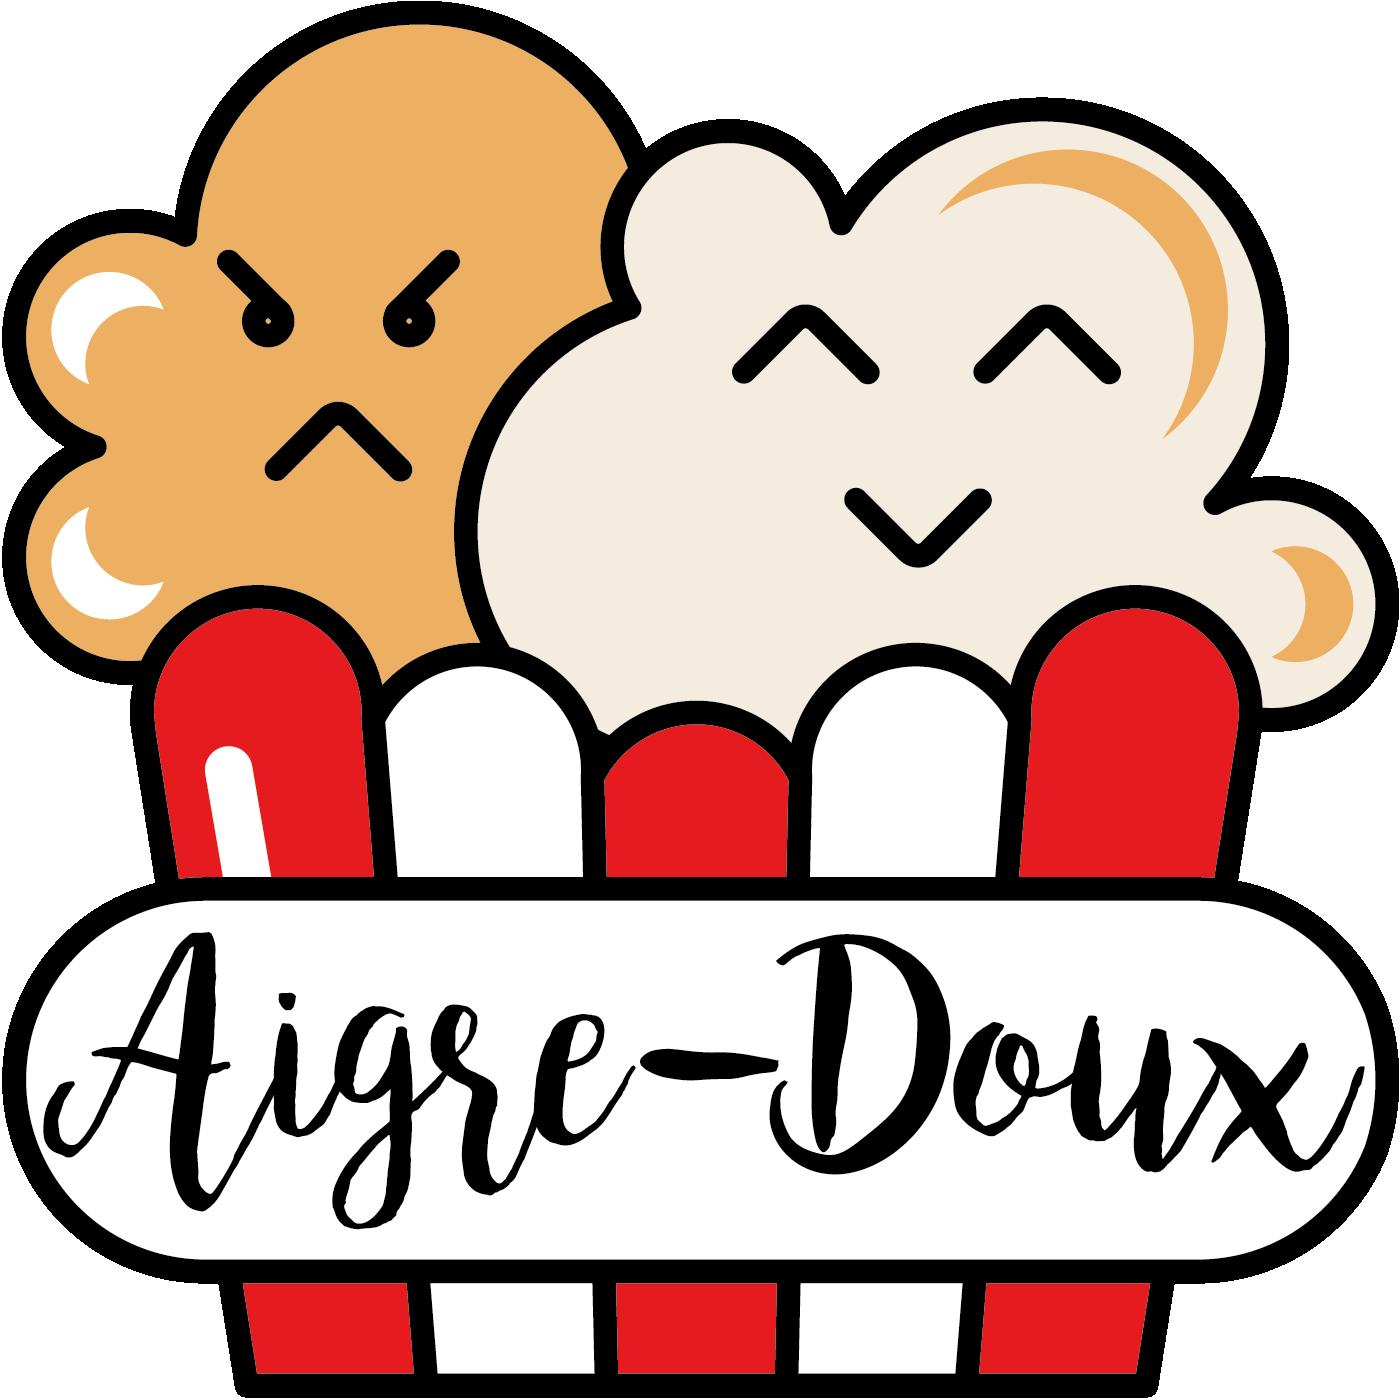 Popcorn Aigre-Doux